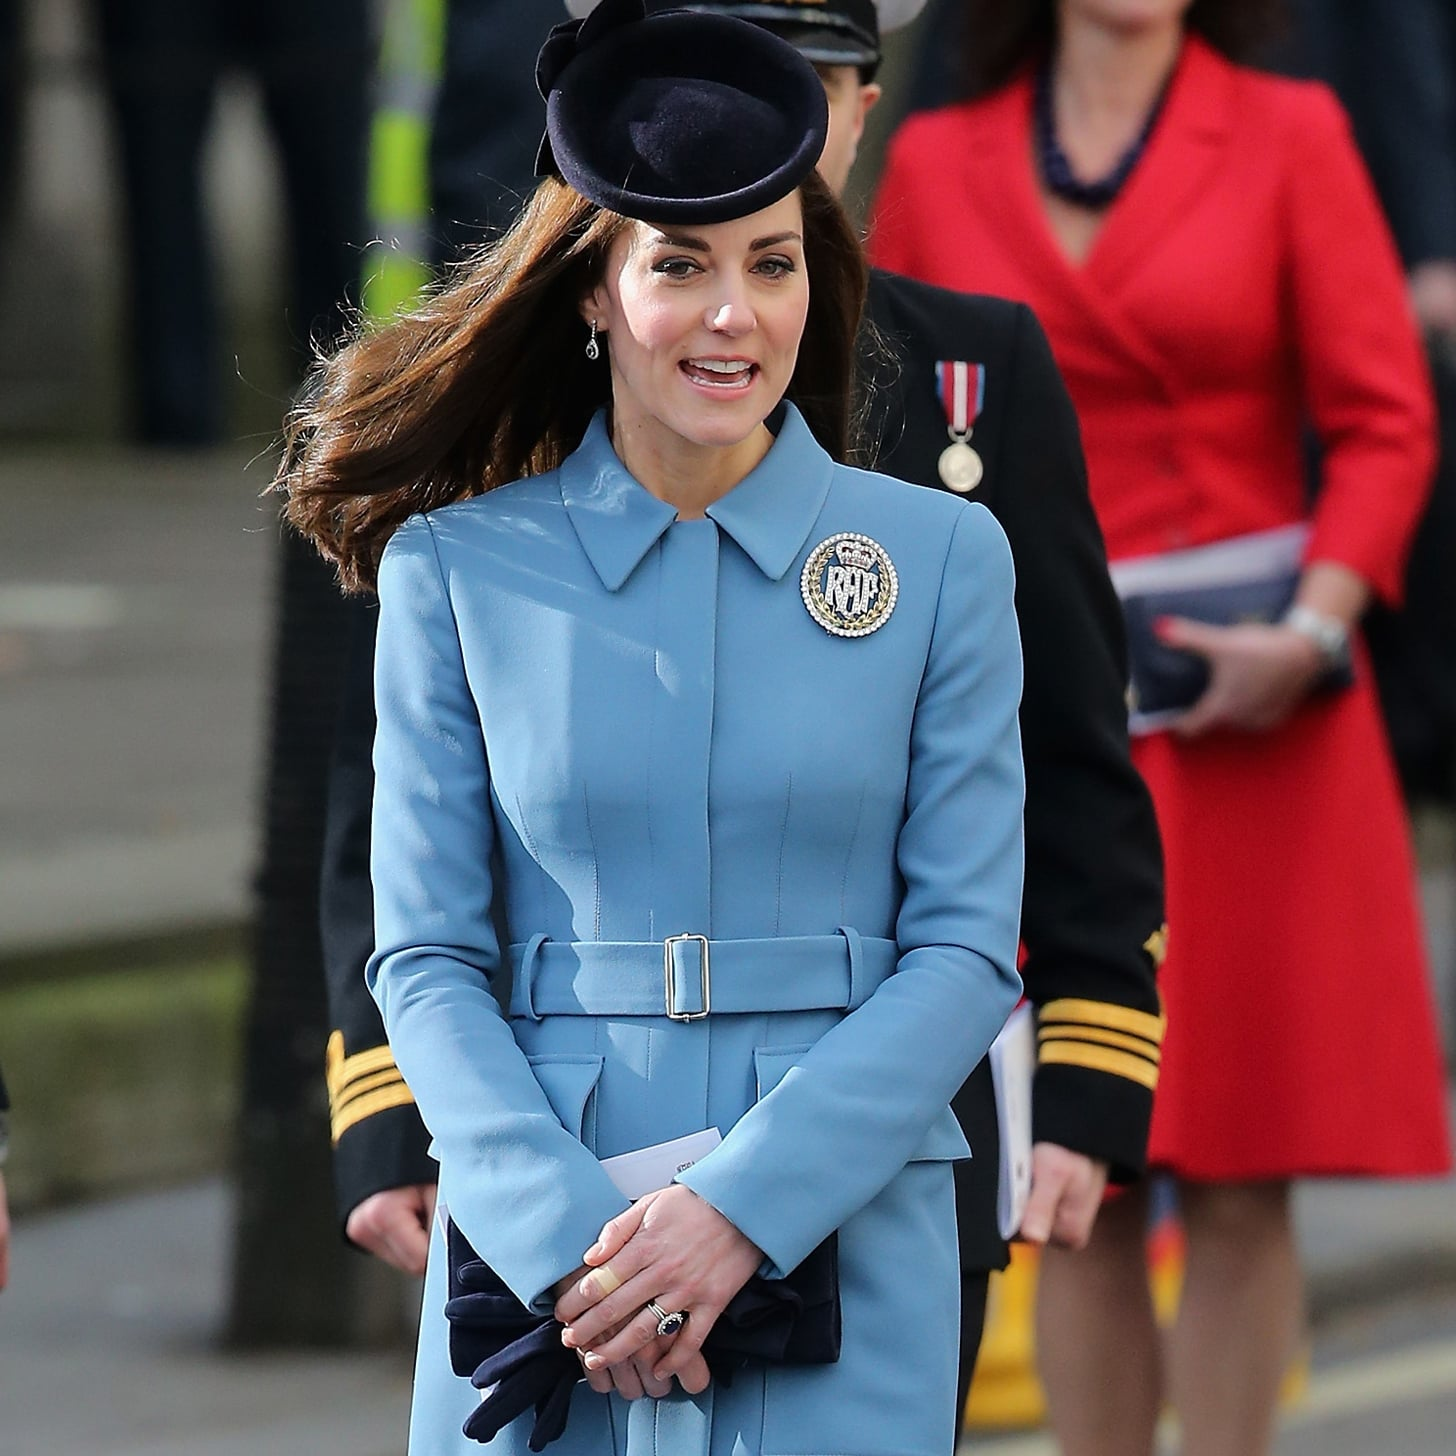 Kate Middleton Wears a Diamond Brooch | 2016 | POPSUGAR Fashion UK